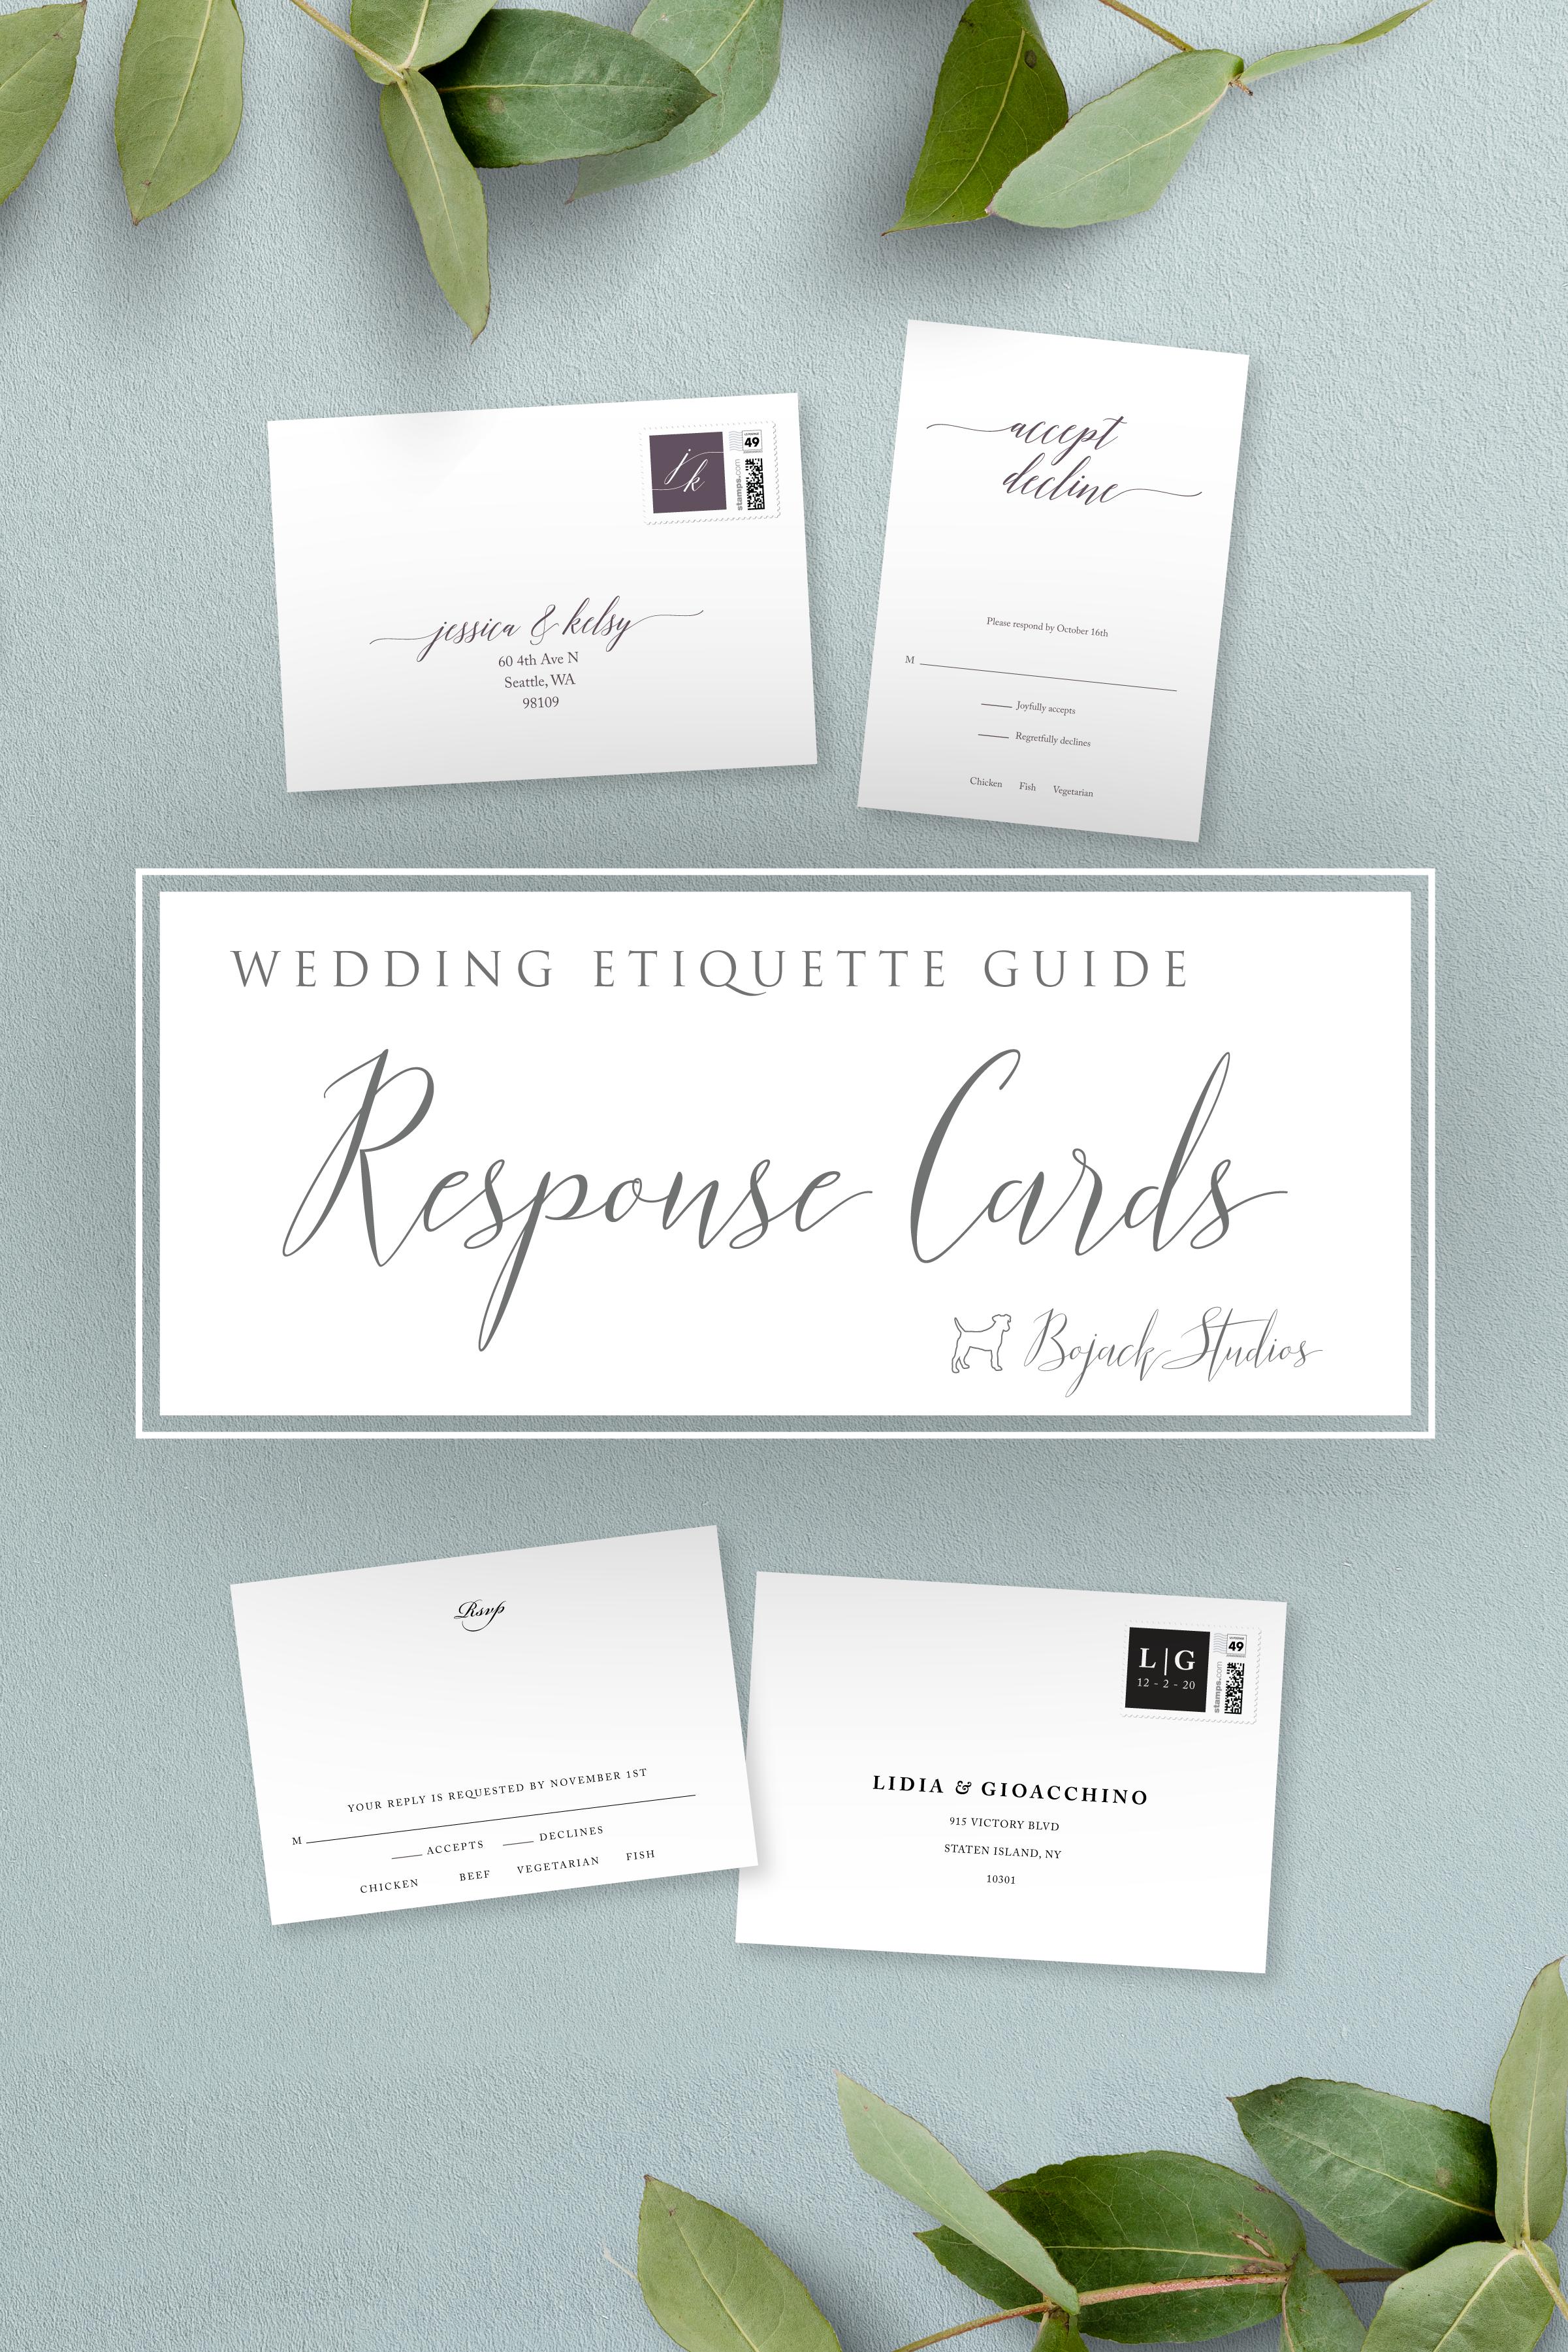 Wedding Rsvp Card Etiquette Bojack Studios Wedding Etiquette Guide Rsvp Wedding Cards Wedding Rsvp Wedding Etiquette